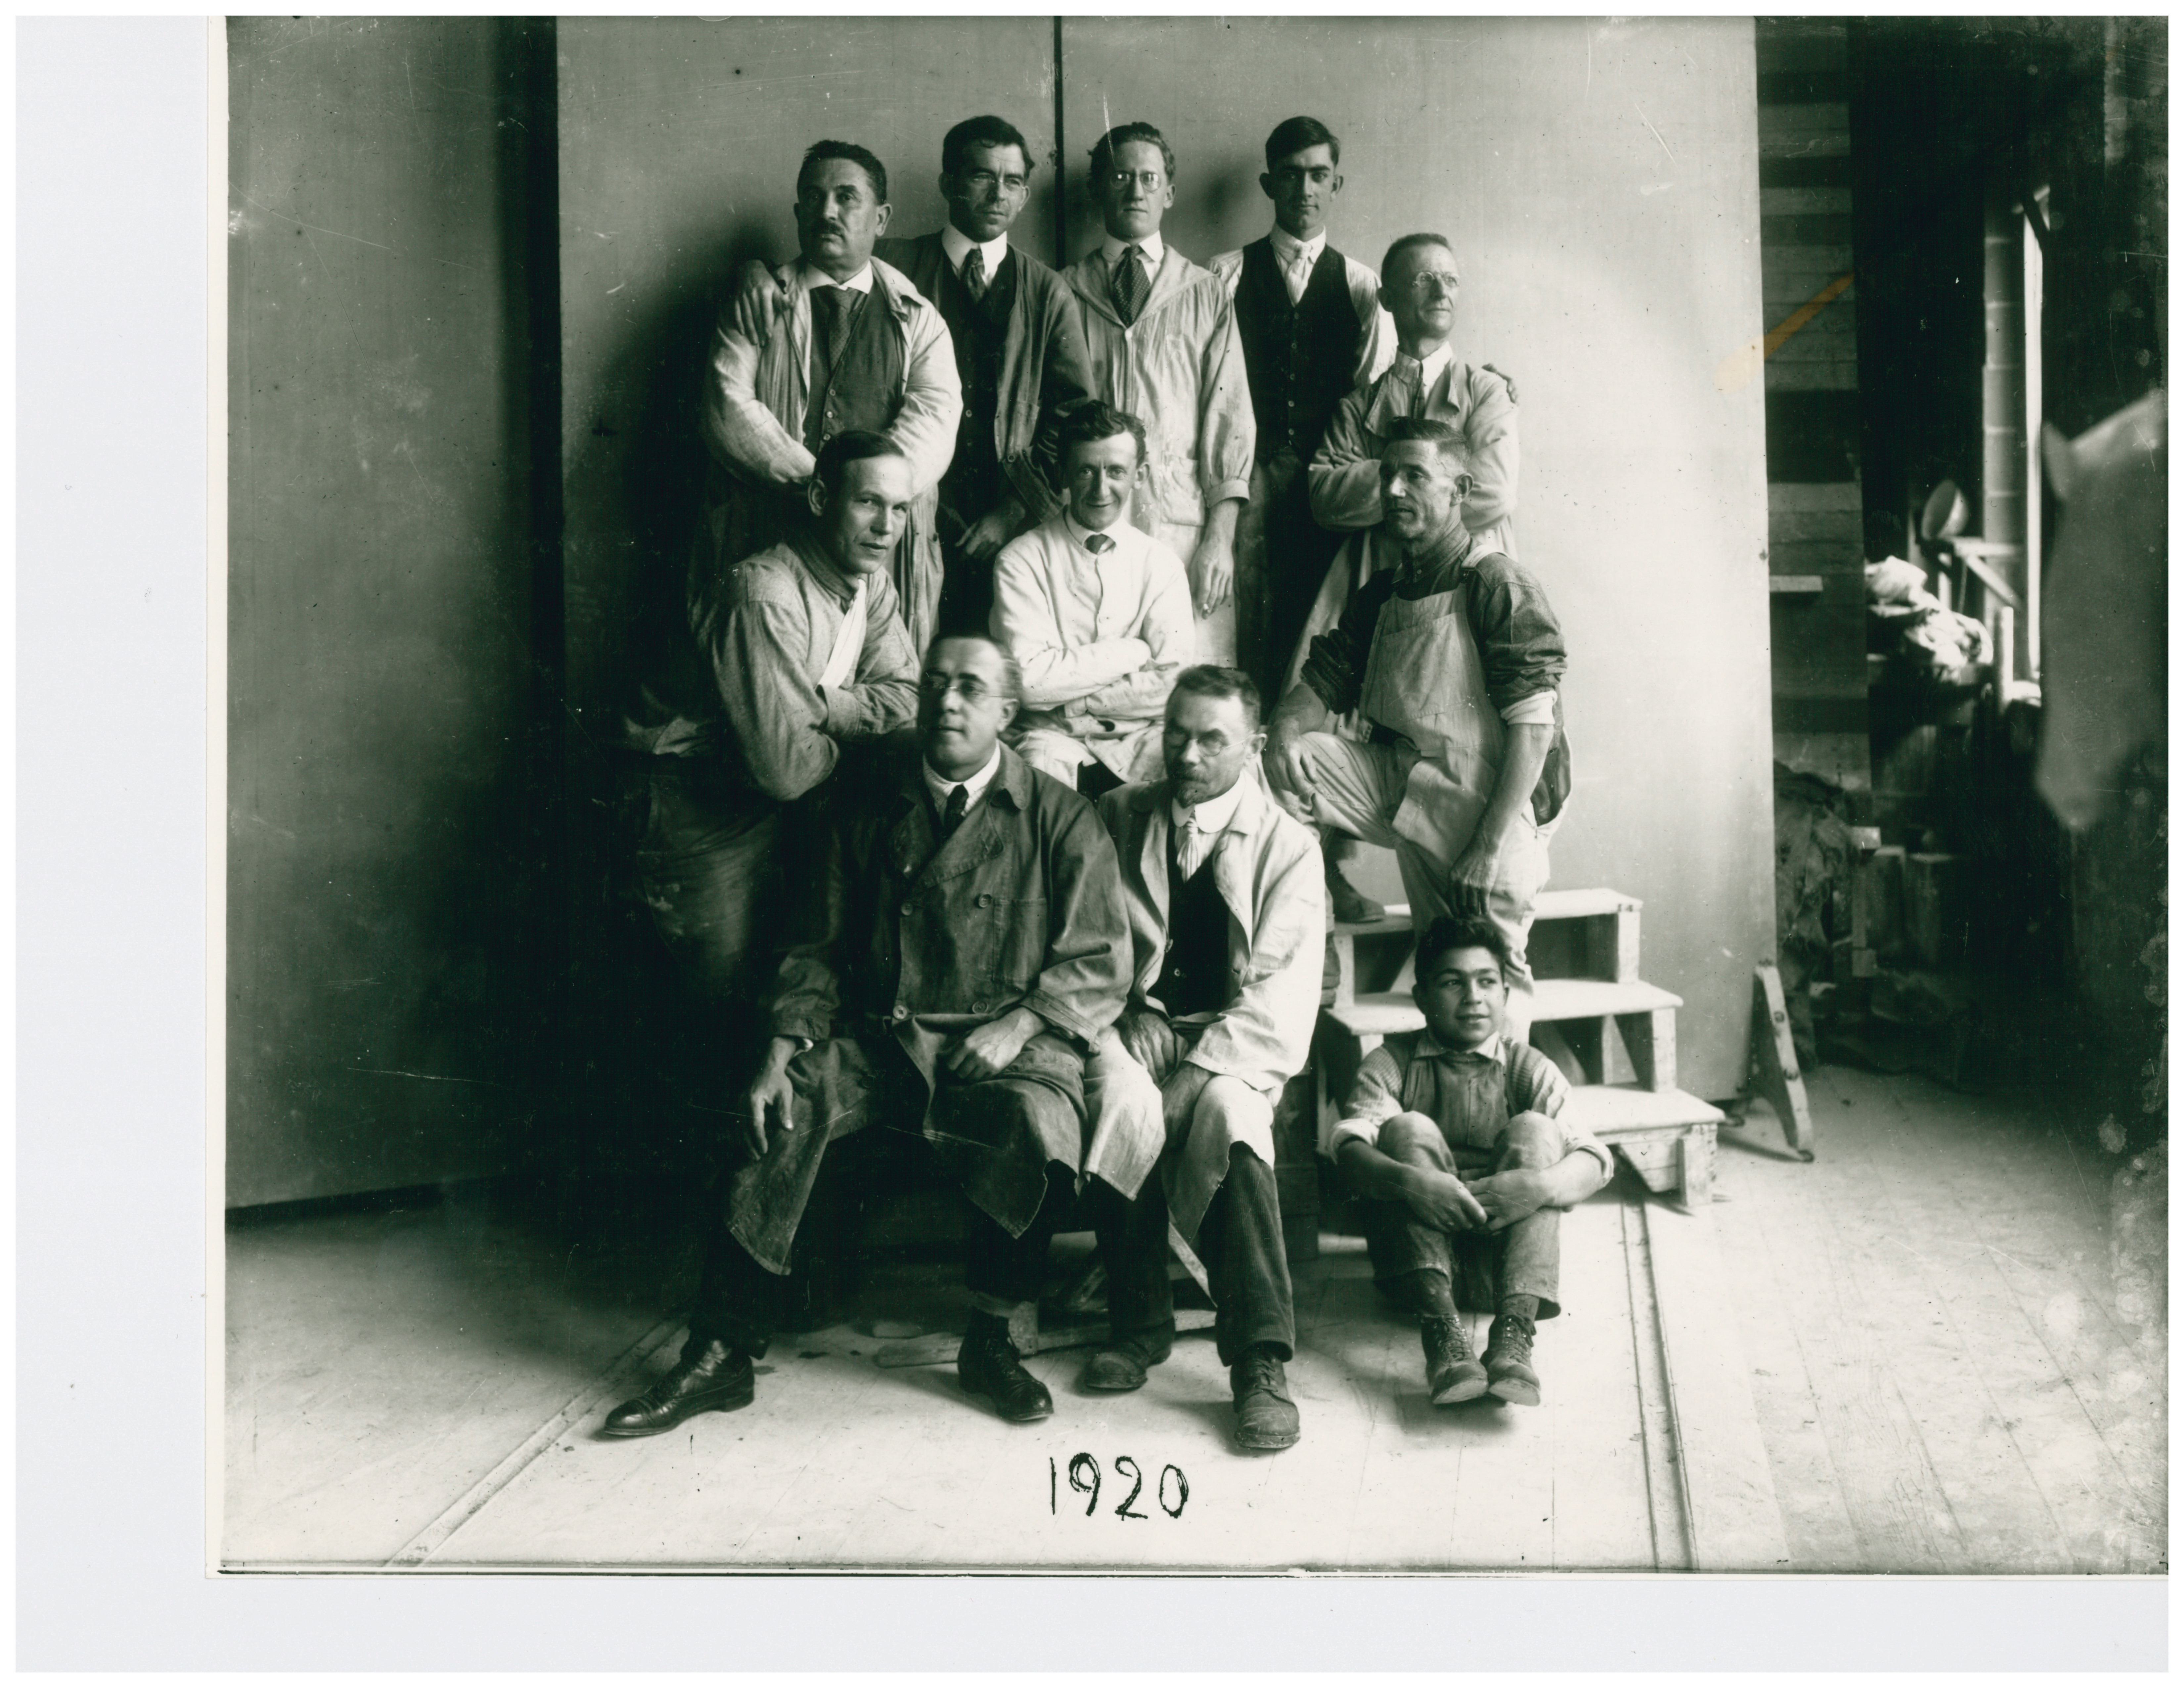 1920 Modelers